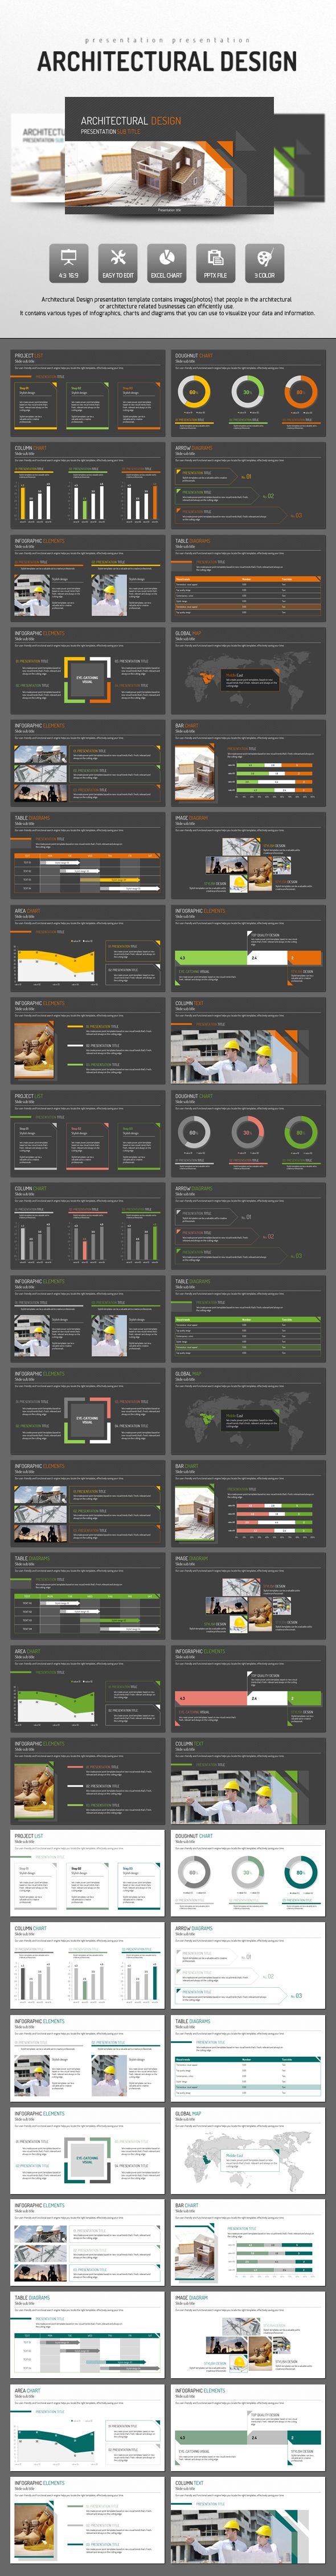 Architectural PowerPoint Presentation Template #design #slides Download: http://graphicriver.net/item/architectural-design/14422738?ref=ksioks